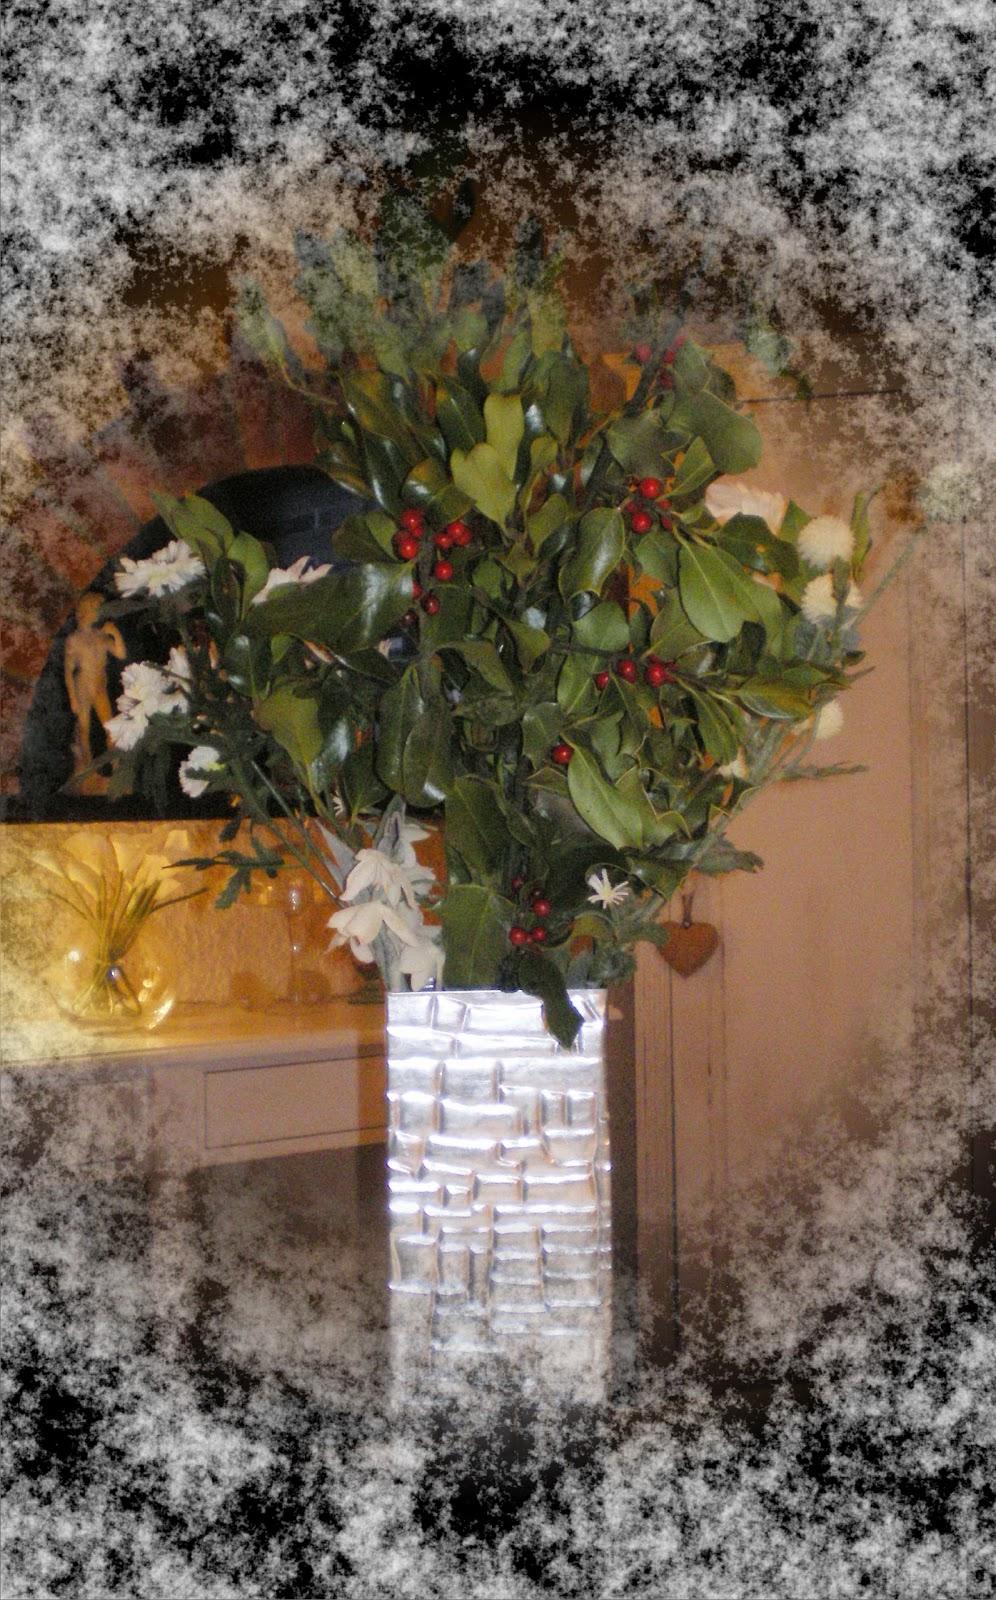 Trendy homes a very happy new year - Le houx porte bonheur ...